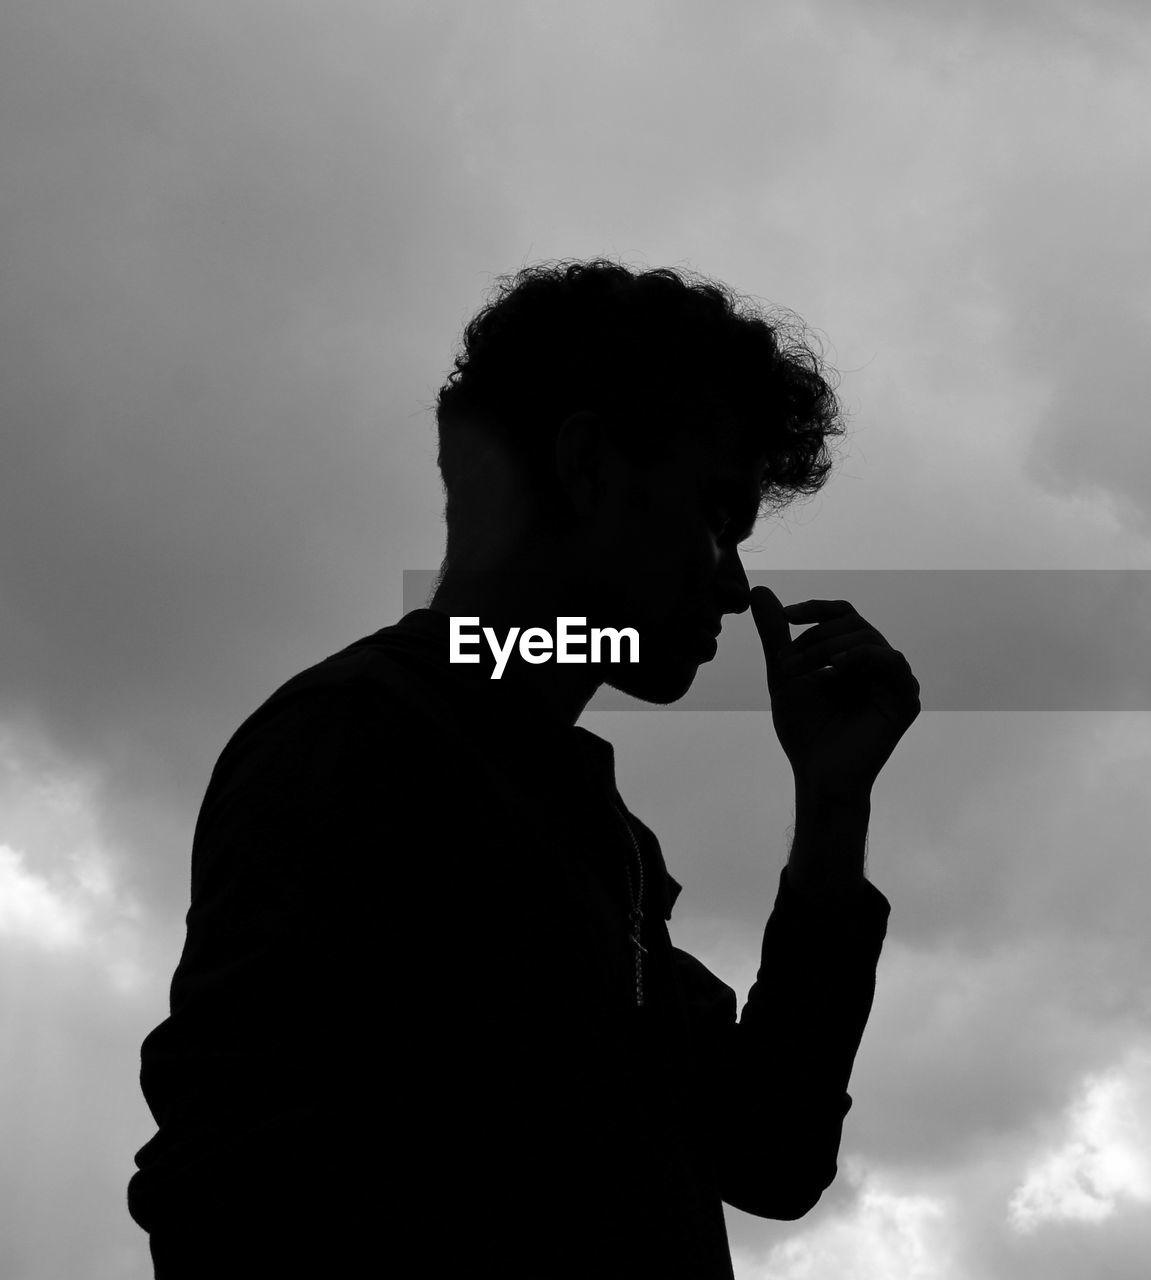 Silhouette man smoking cigarette against sky